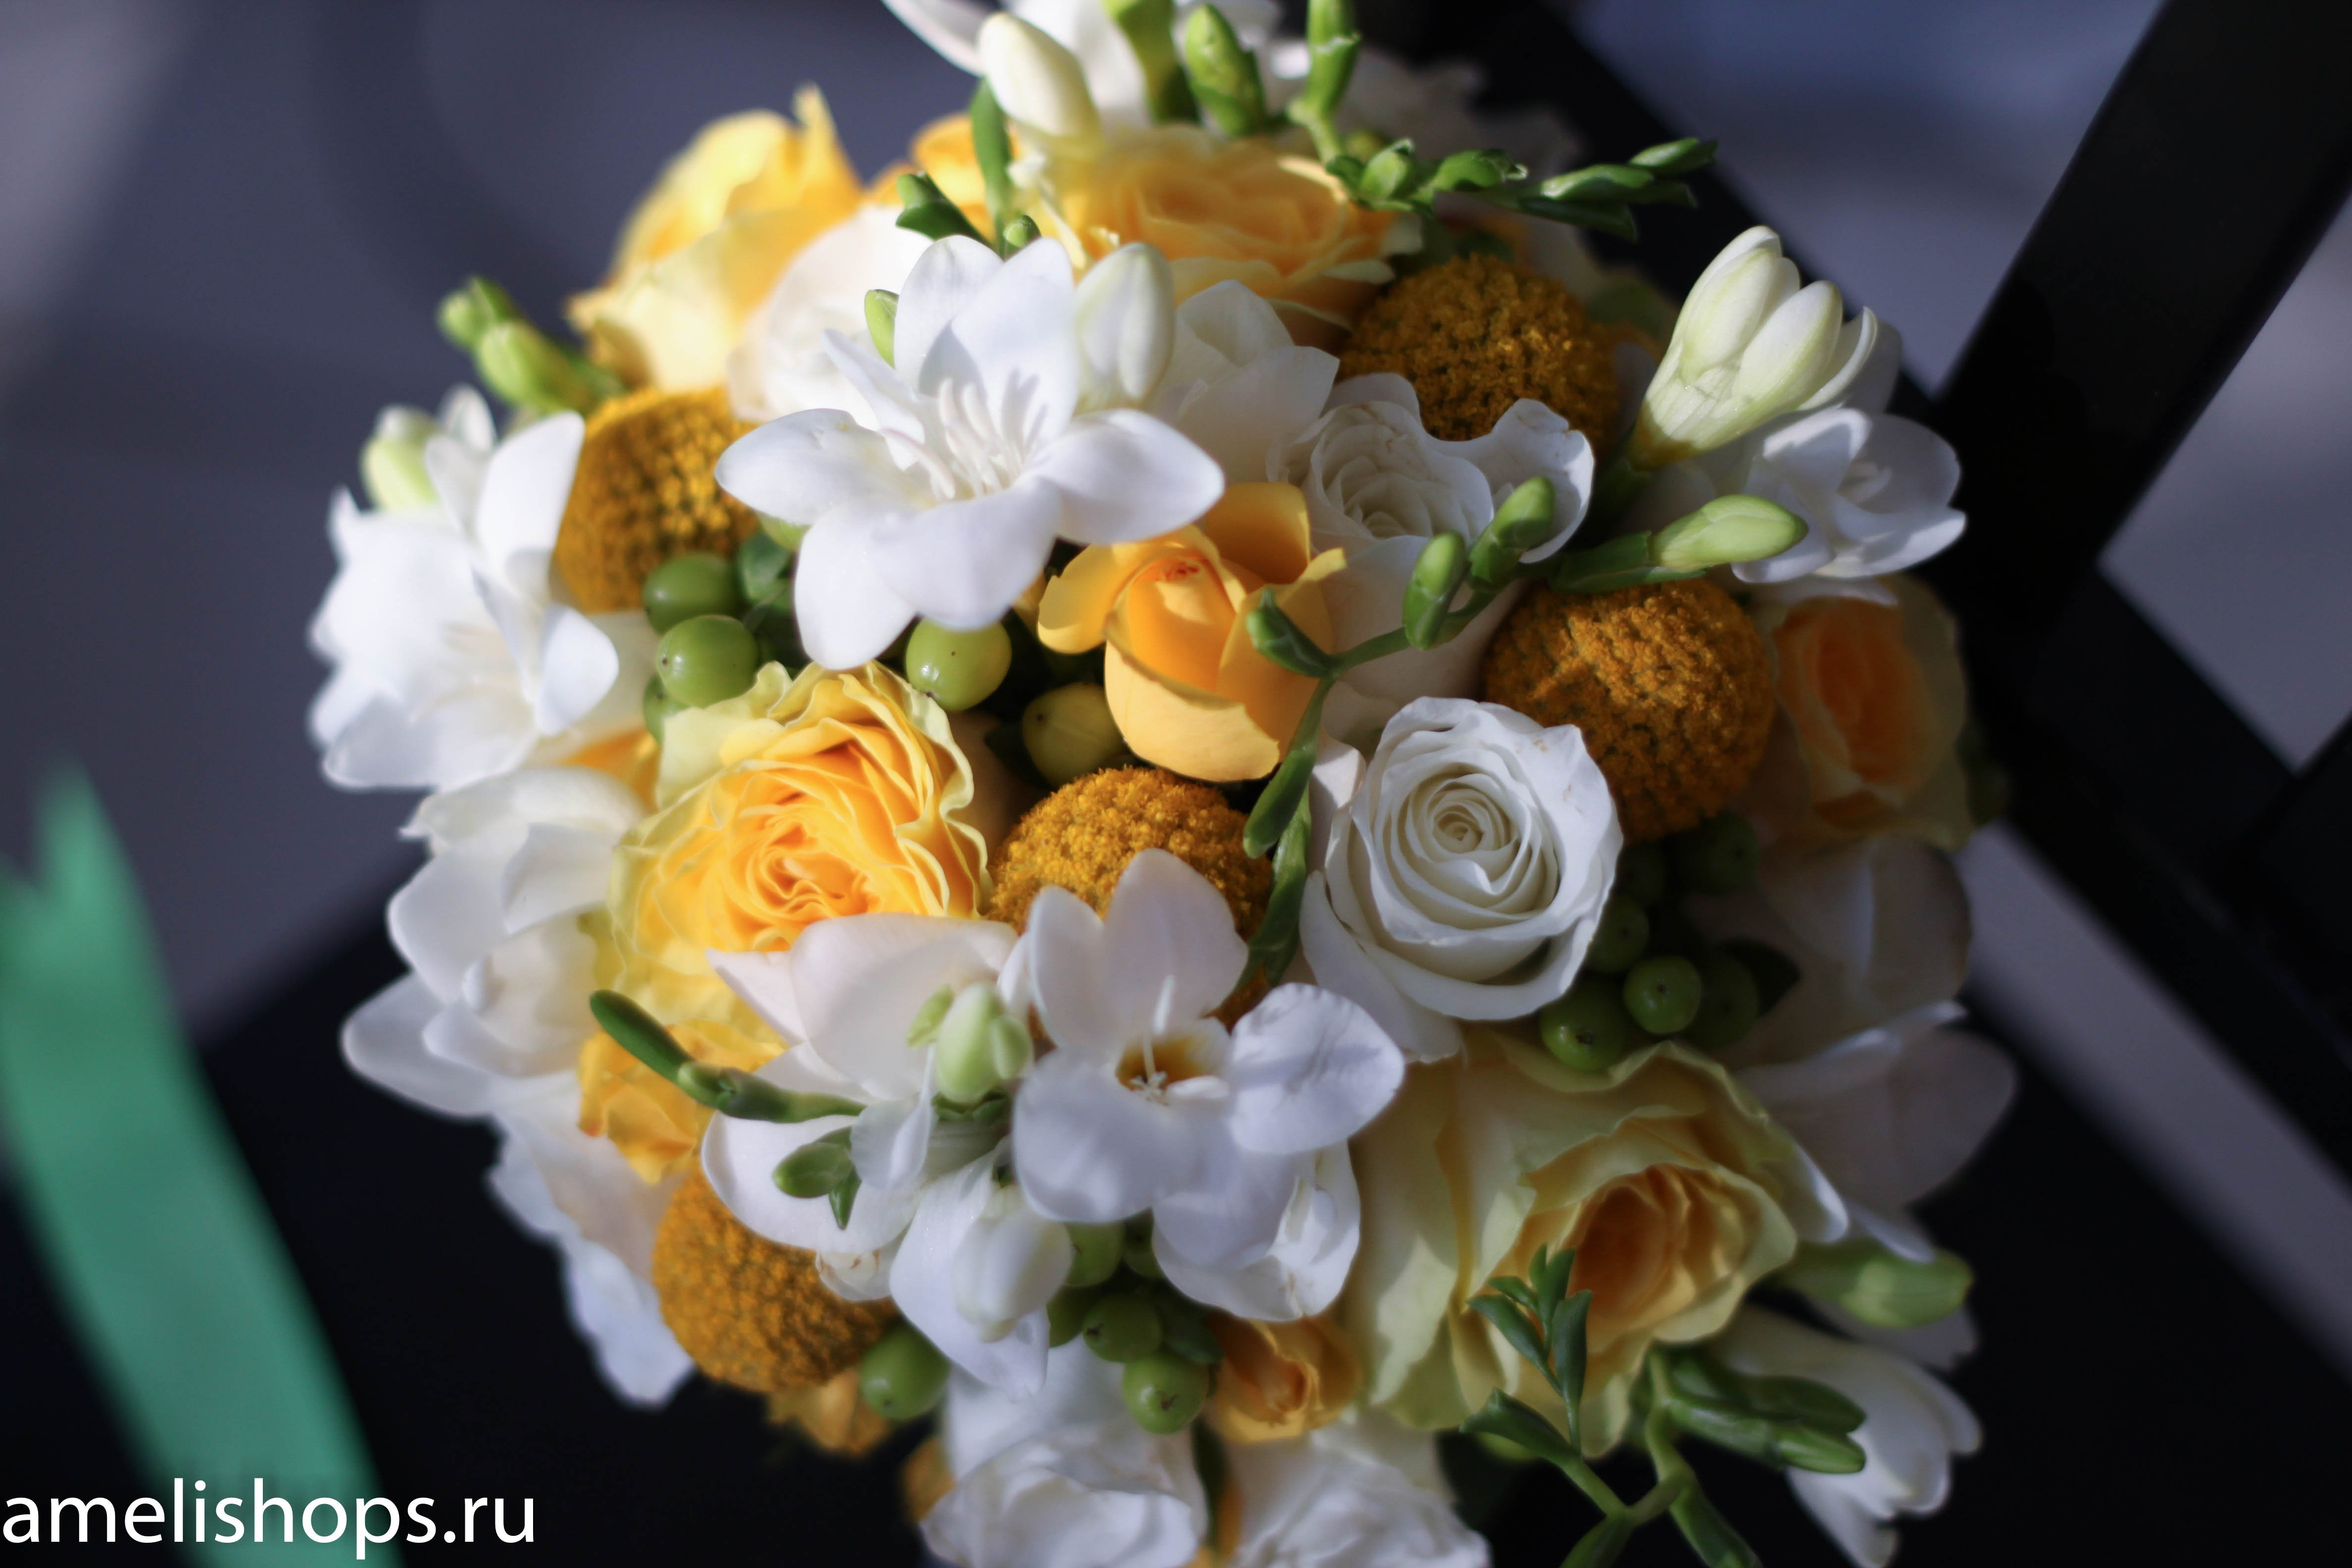 http://amelishops.ru/images/upload/IMG_5138.jpg